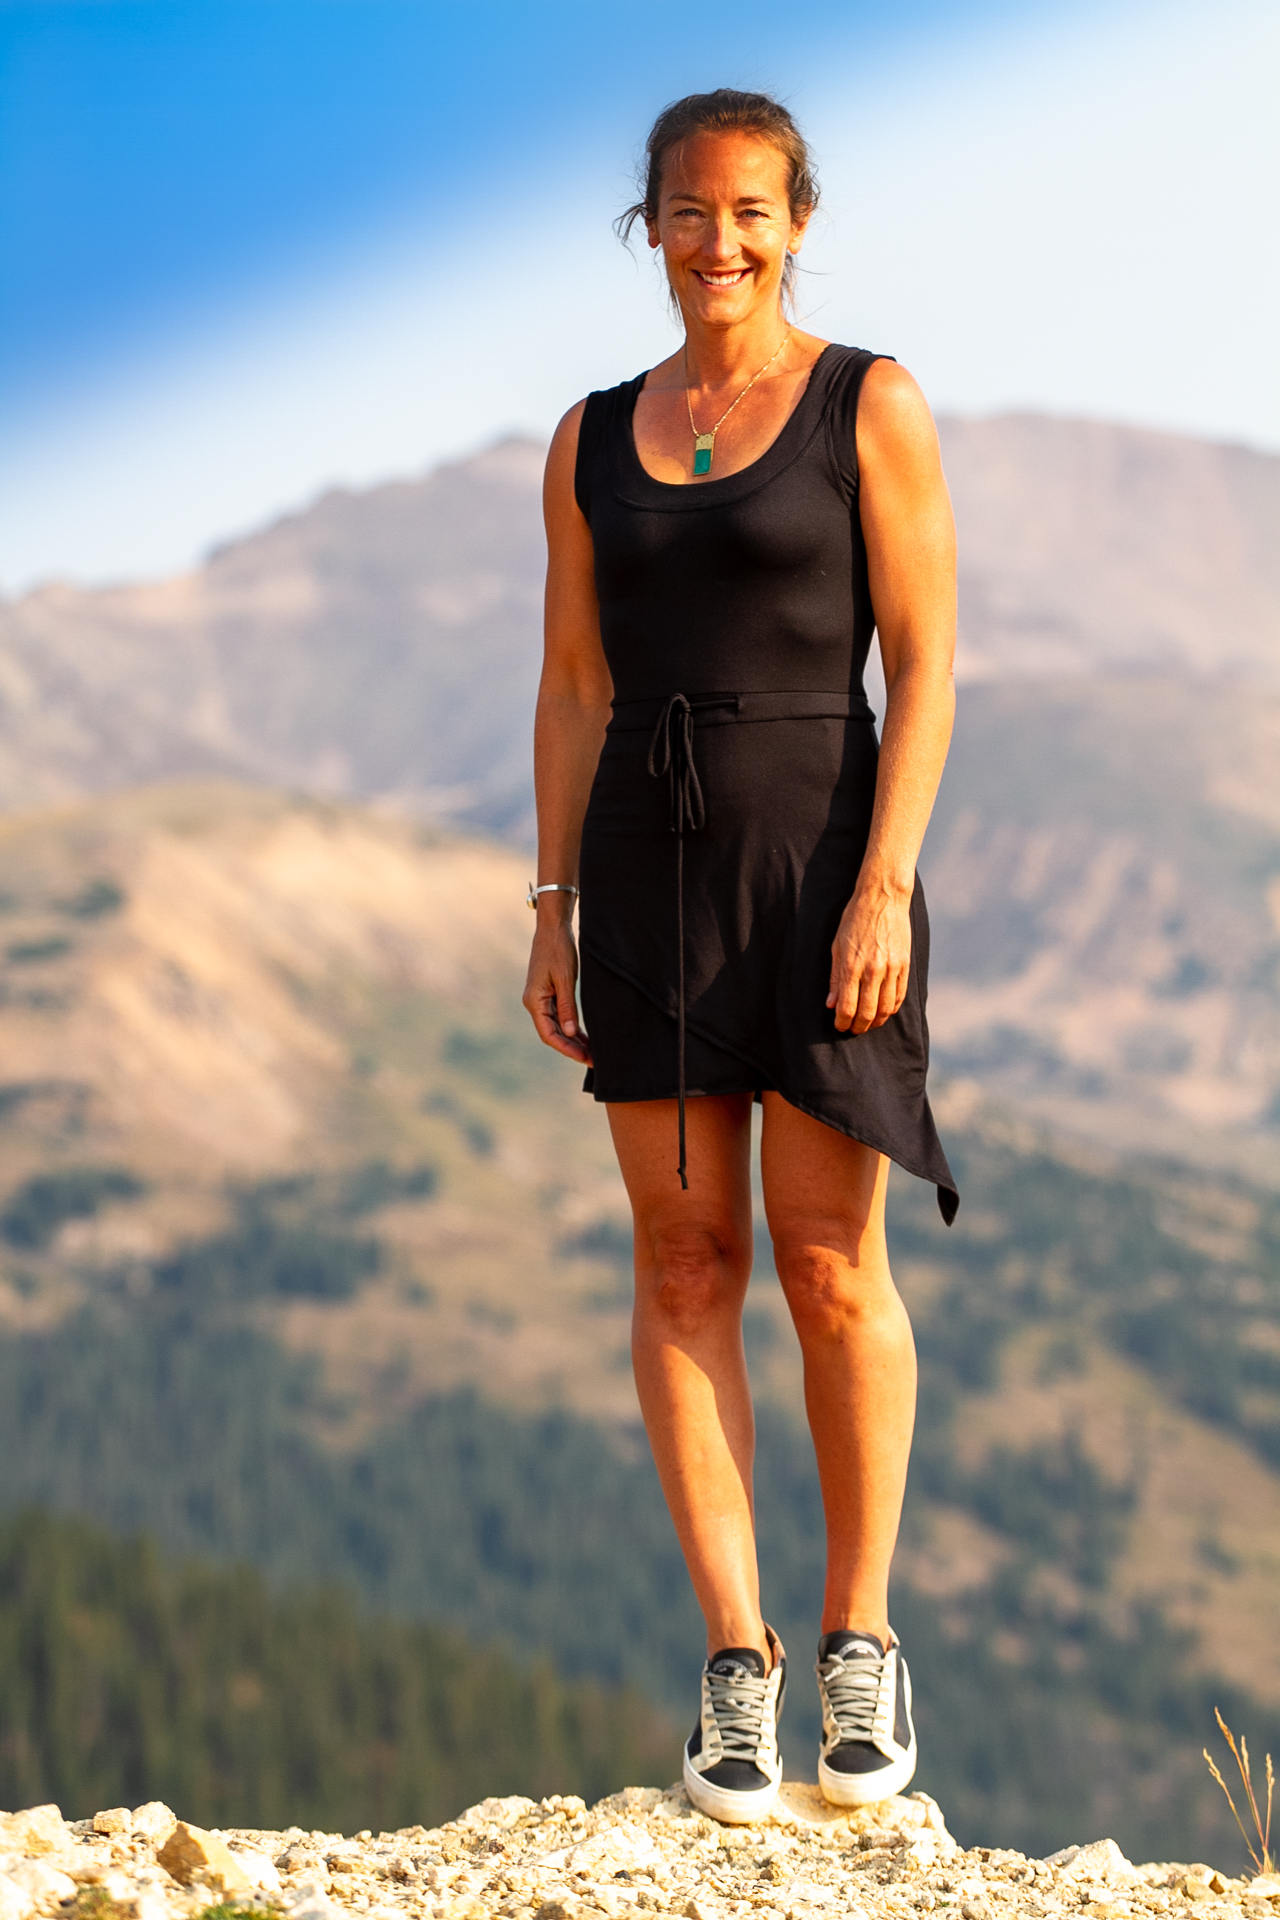 Fashion Design Autumn Warner wearing a cute black tennis dress with pockets